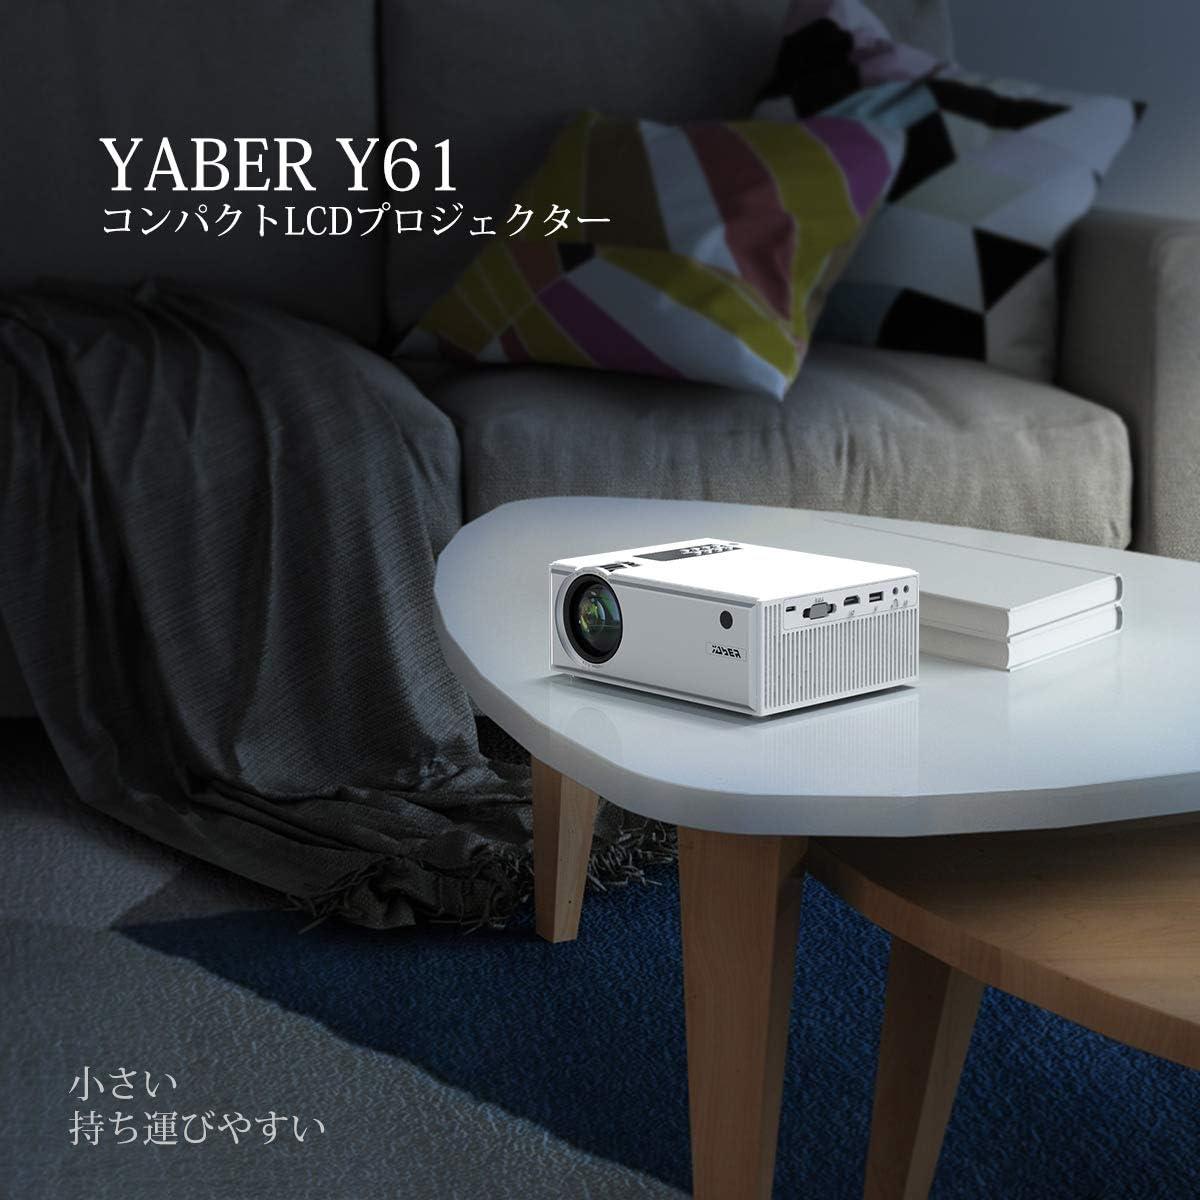 YABER 小型 おすすめ 人気プロジェクター 4600lm WiFiでスマホに直接接続 1920×1080最大解像度 ホームシアター